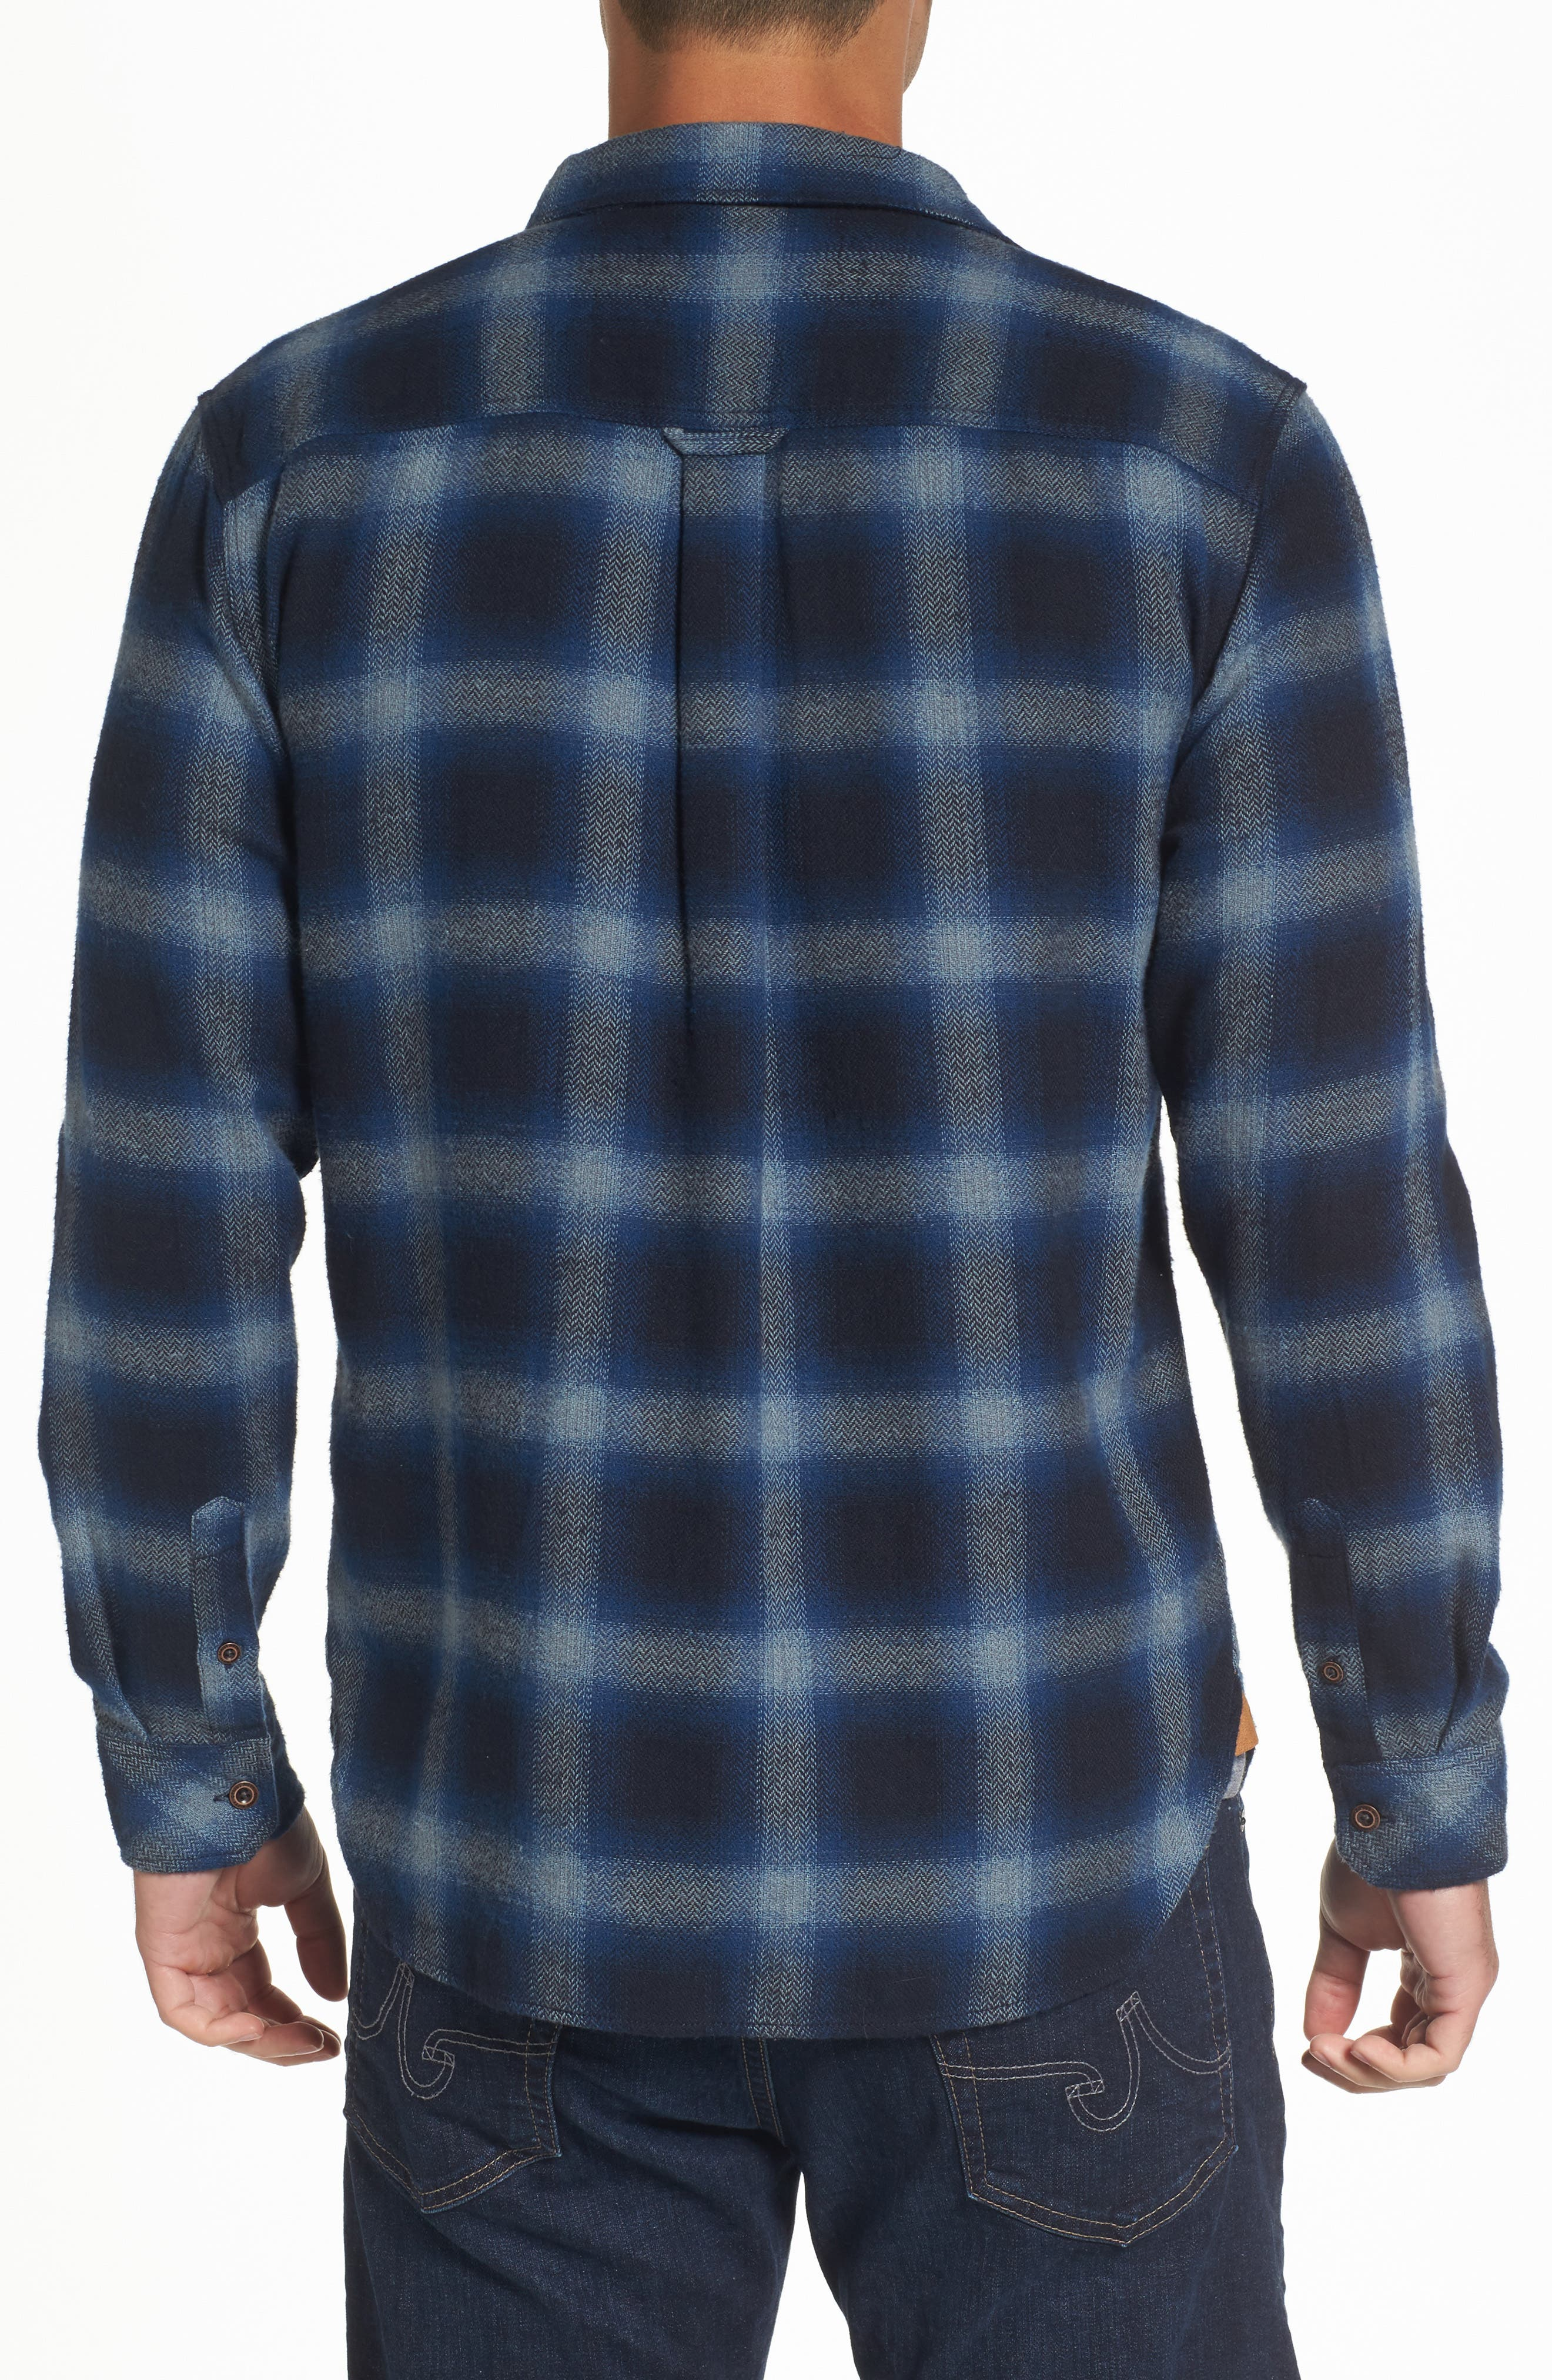 Truman Outdoor Check Sport Shirt,                             Alternate thumbnail 2, color,                             Navy/ Blue